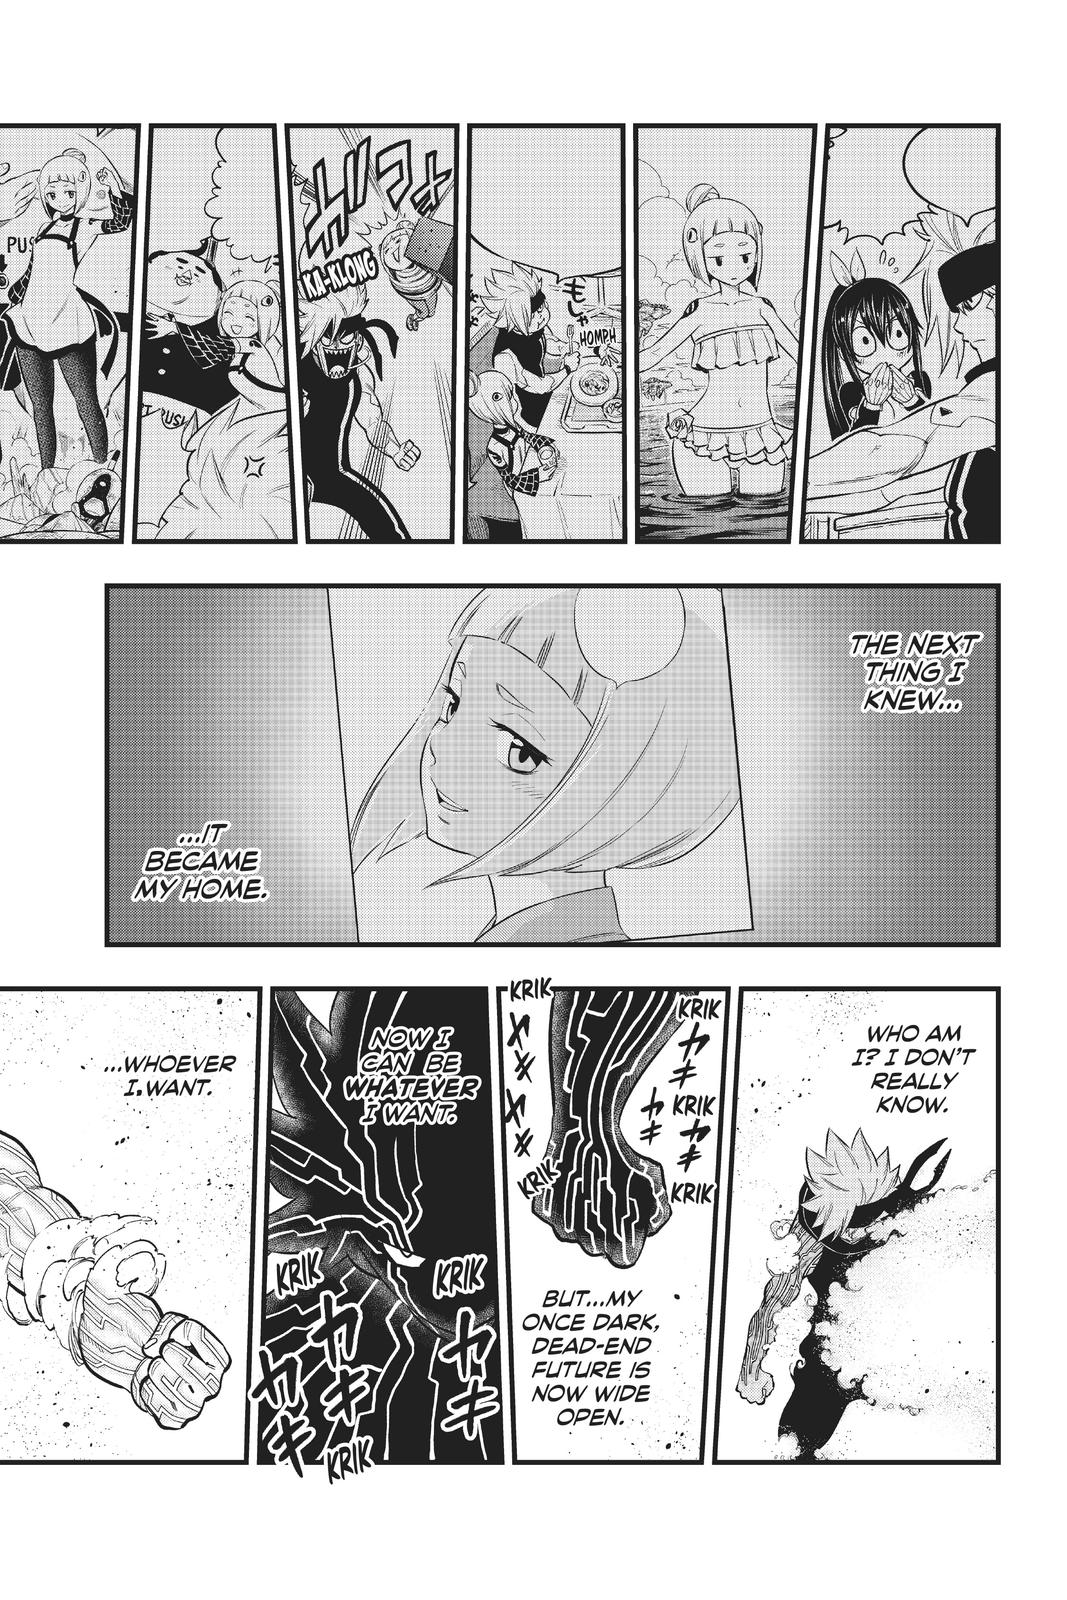 edens zero anime, edens zero game, edens zero characters, edens zero release date, edens zero trailer, edens zero wiki, edens zero anime announcement, edens zero anime adaptation release date, edens zero rebecca, shiki granbell, edens zero happy, edens zero 2, edens zero natsu and lucy, edens zero homura, edens zero shiki, edens zero rebecca ether gear, jessie edens zero, edens zero books, is edens zero good